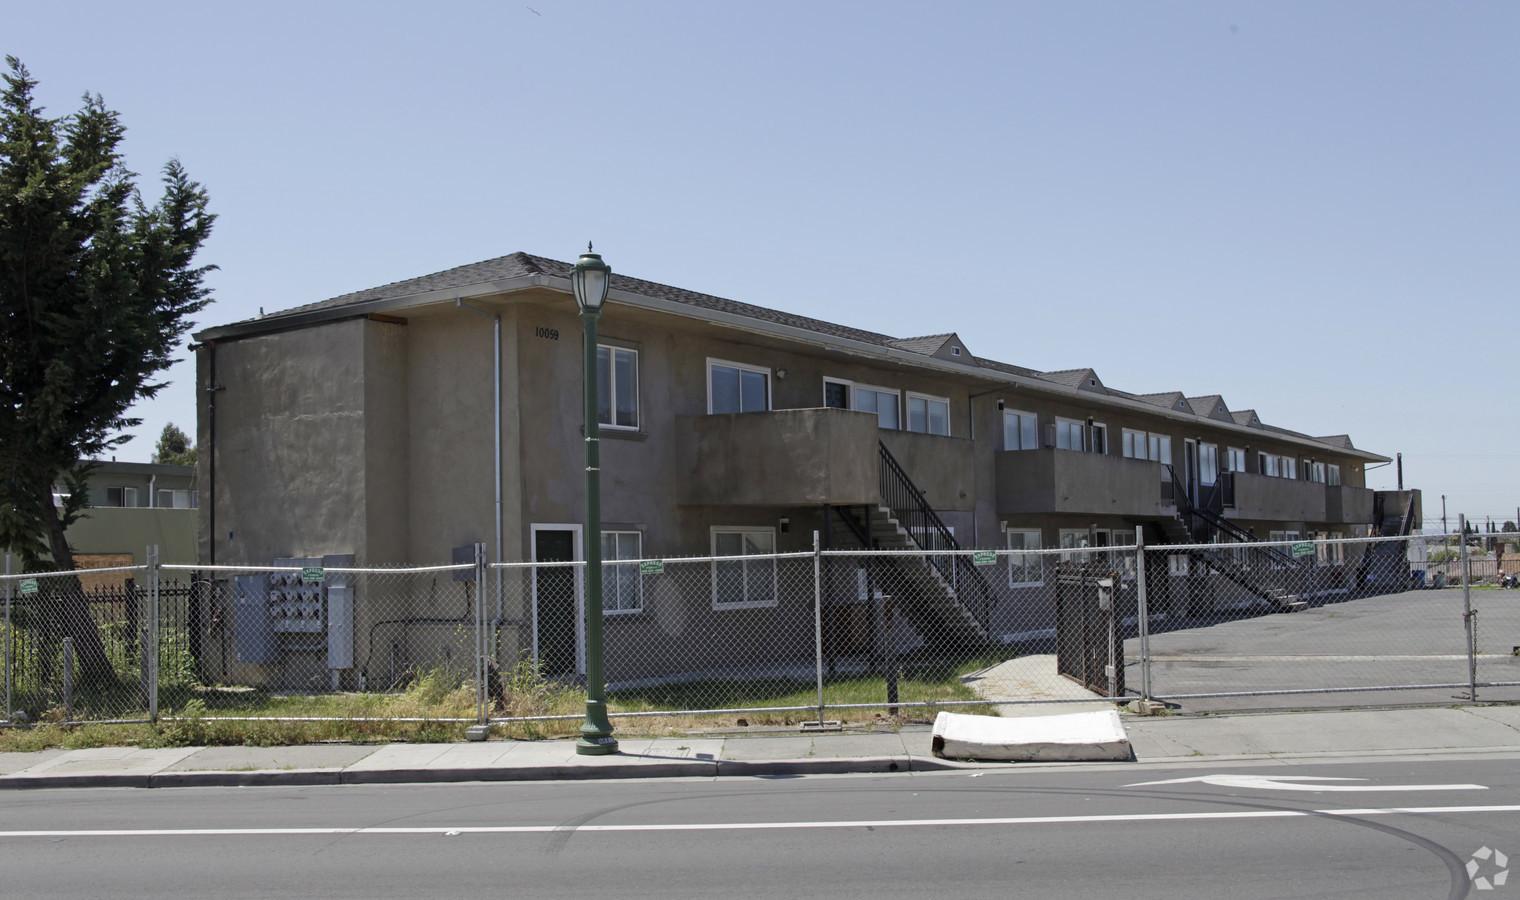 10031 MacArthur Blvd, Oakland